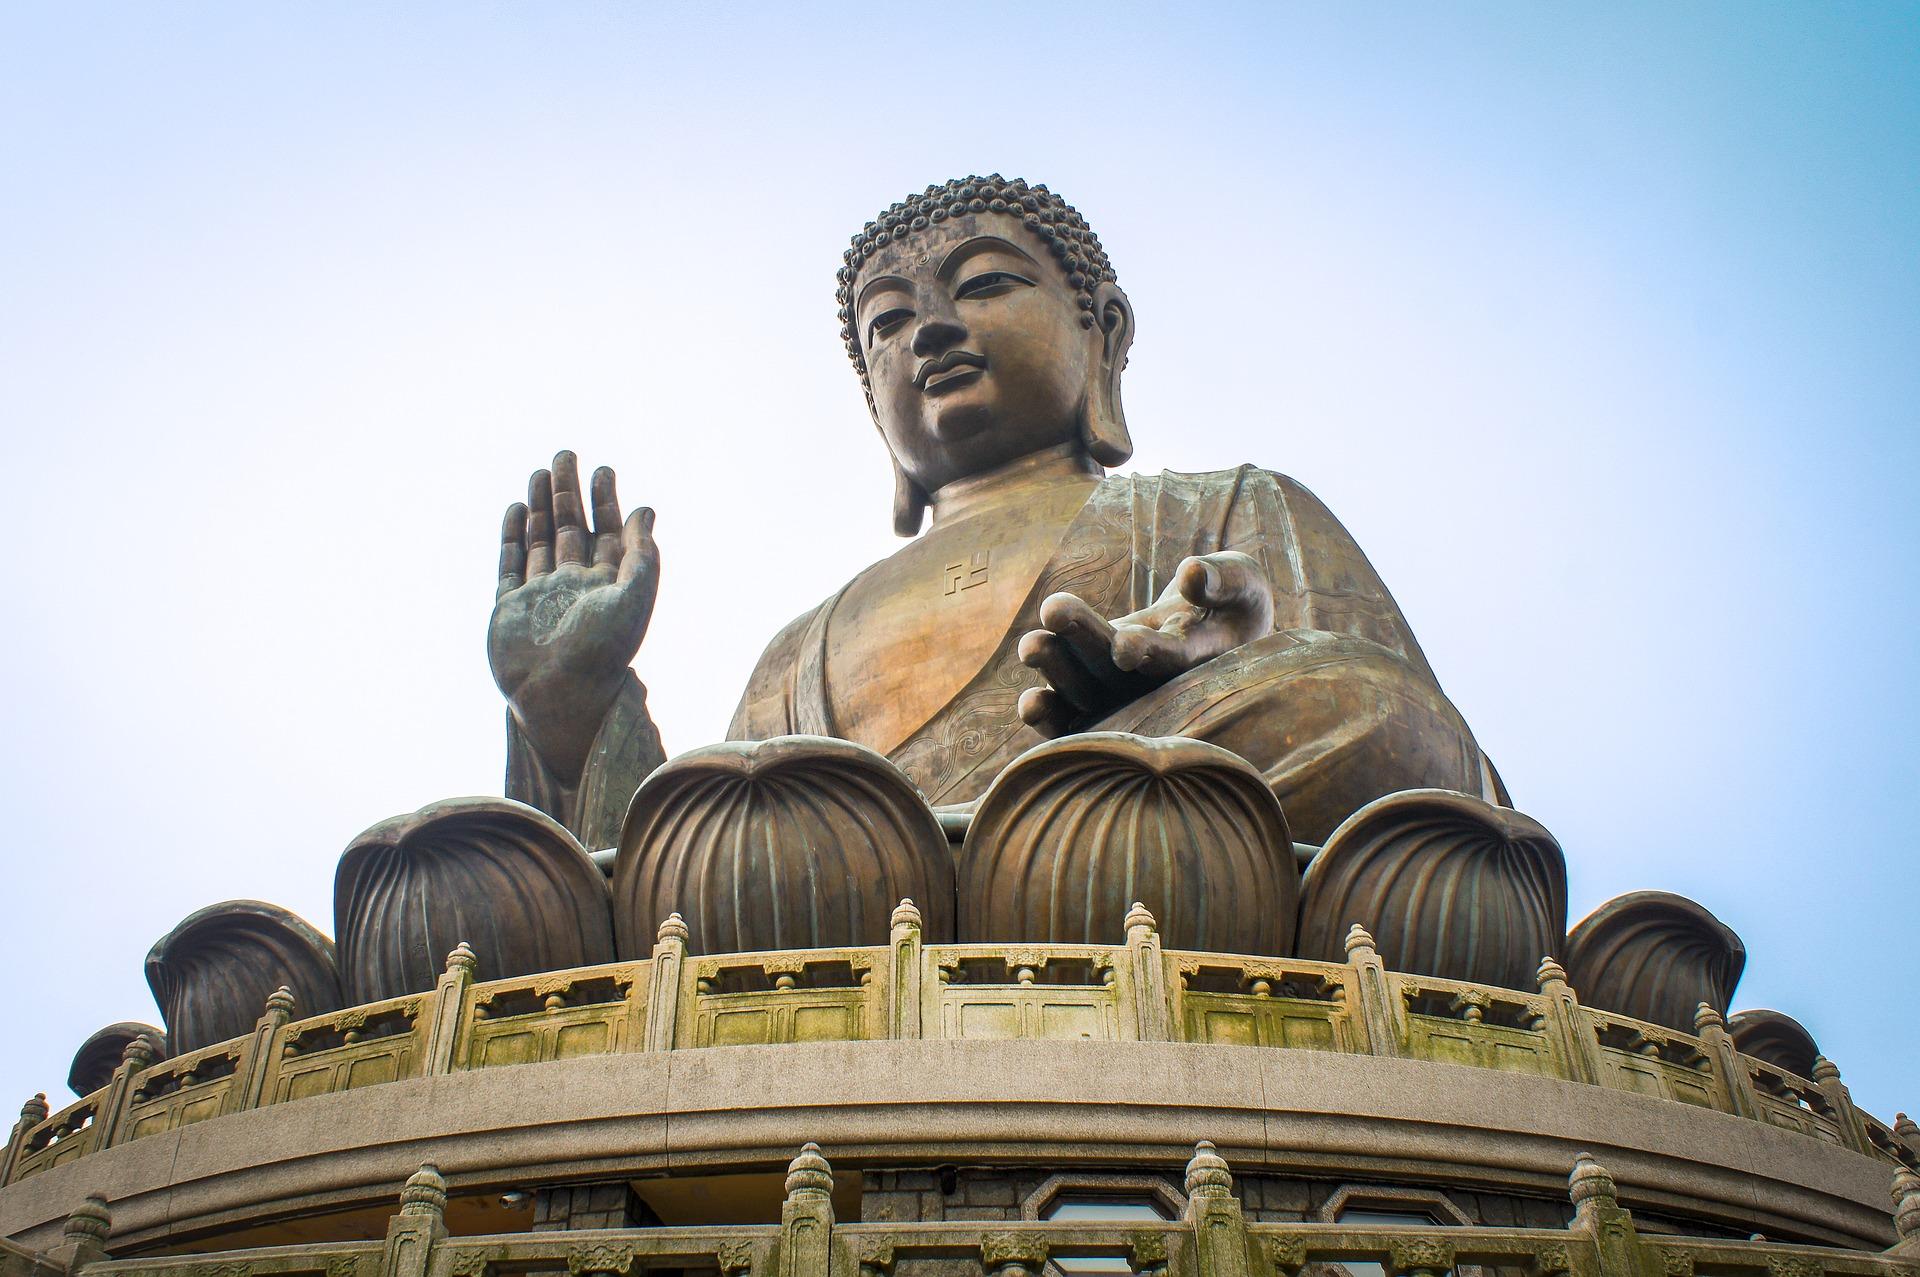 Hong Kong Budget travel guide Big Buddha